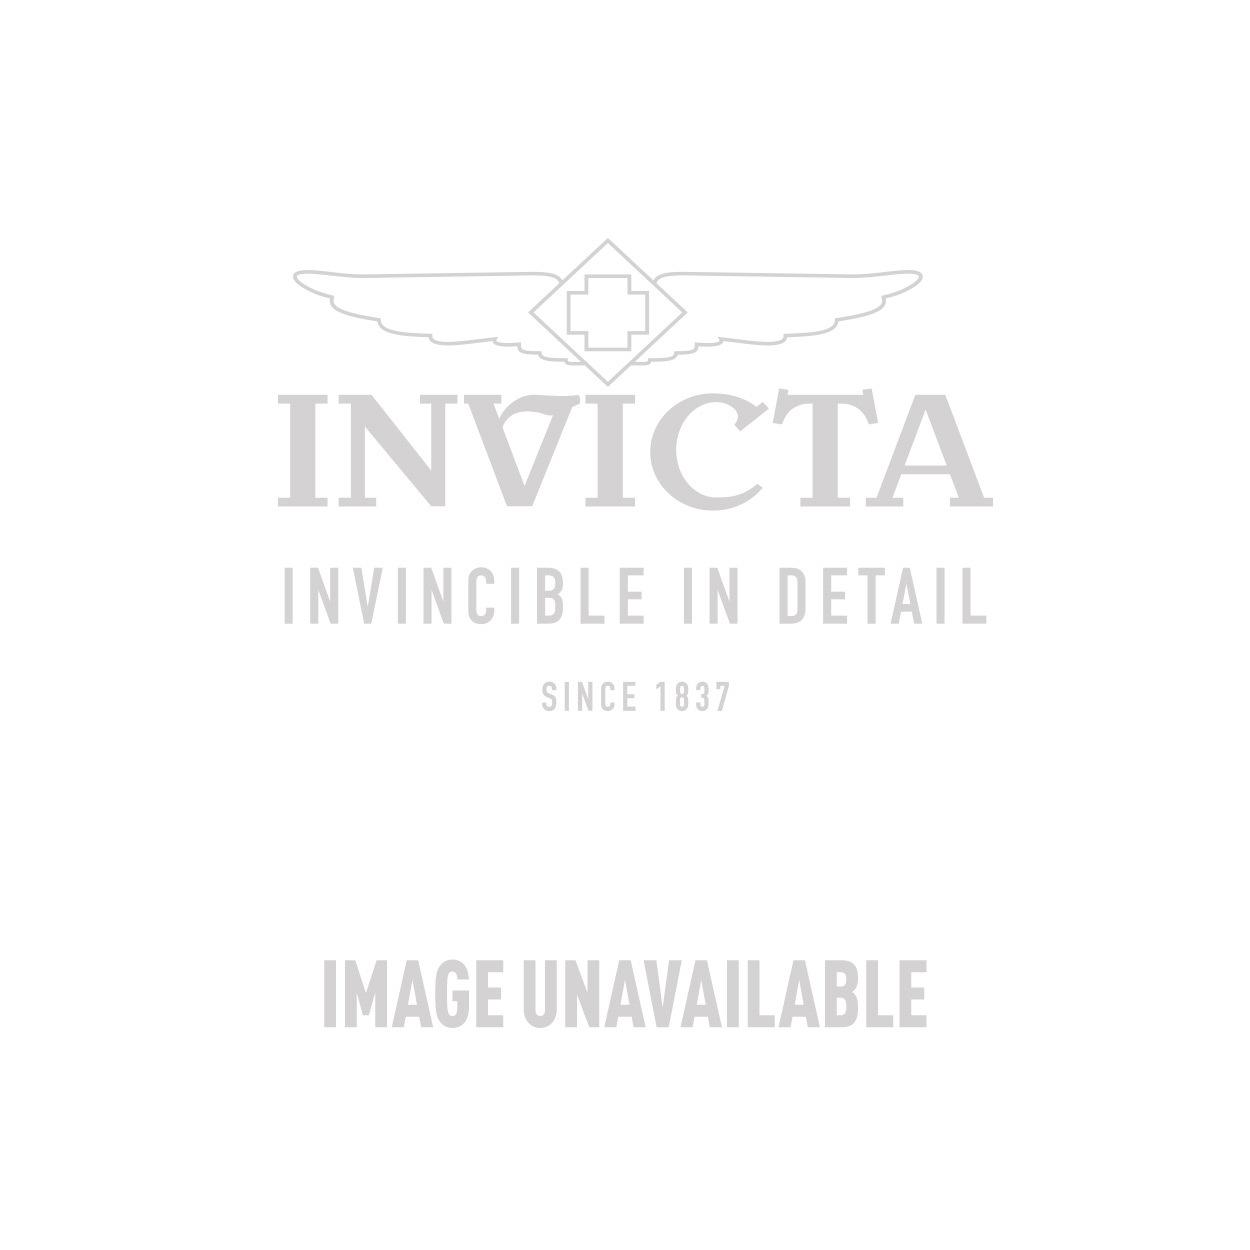 Invicta I-Force Quartz Watch - Gold case with Black tone Rifle band - Model 1515